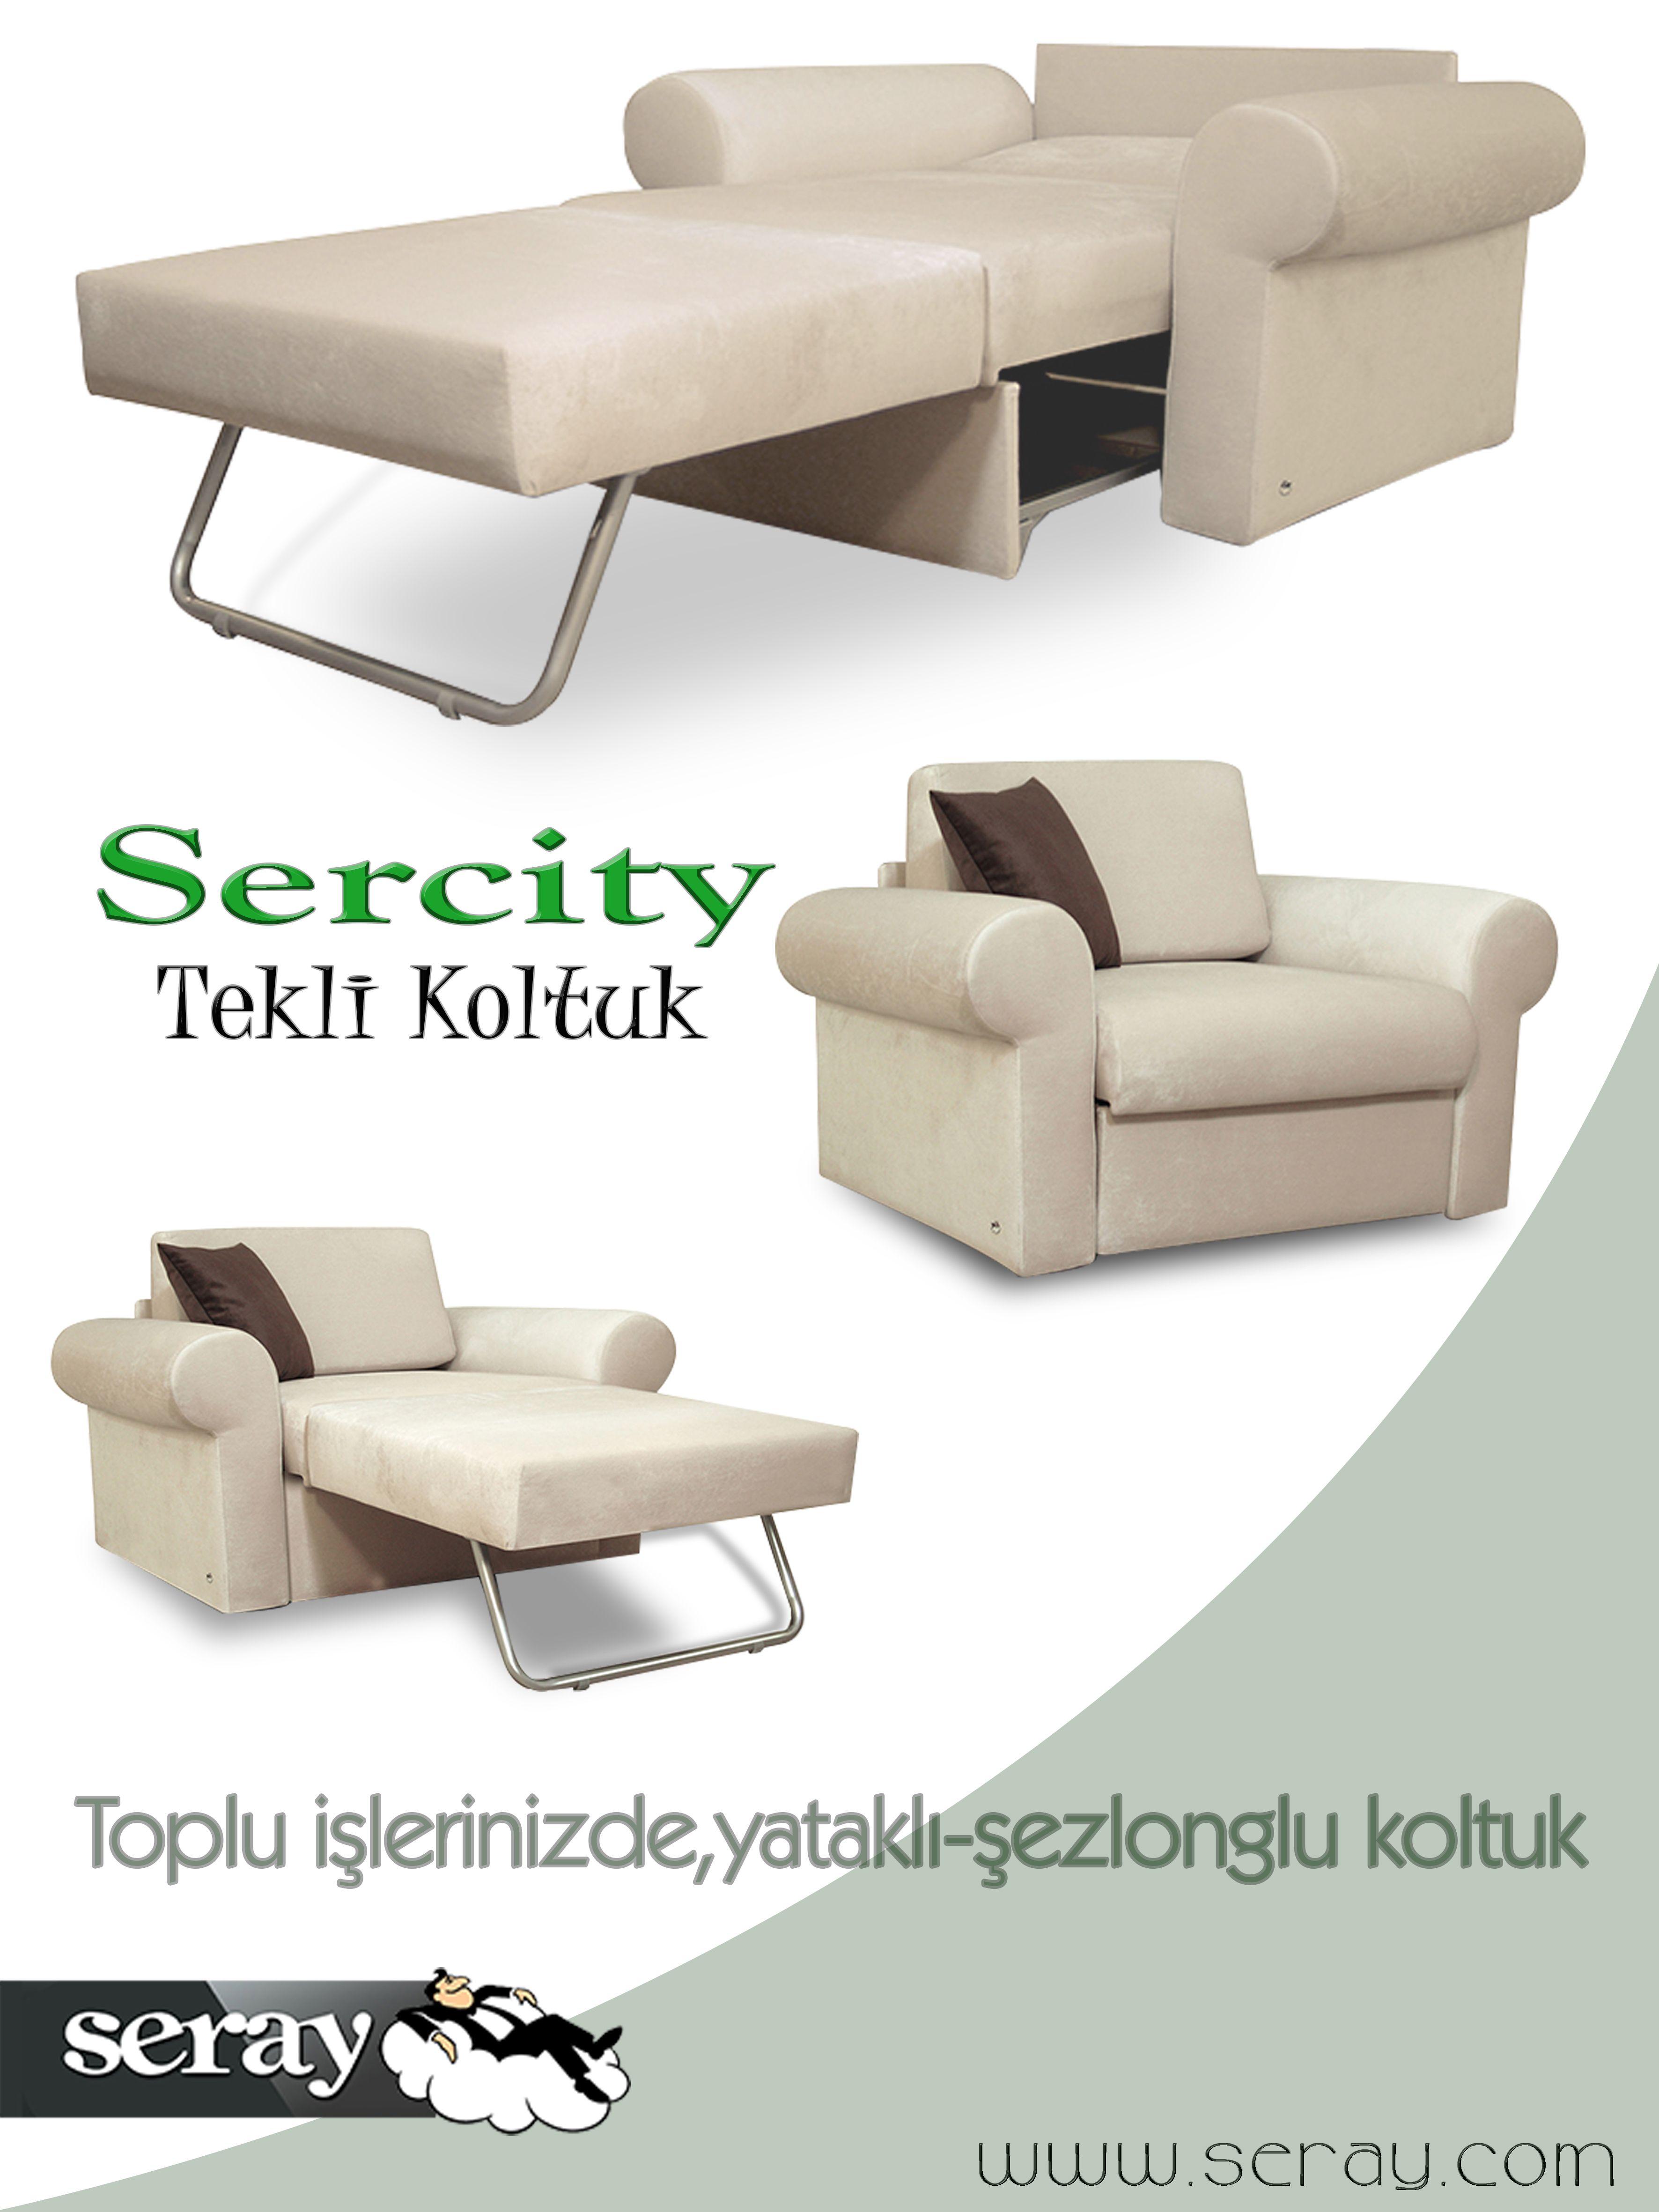 Sercity Yatakli Tekli Koltuk Www Seray Com Koltuk Yataklikoltuk Teklikoltuk Modern Rahat Ev Home Tekli Koltuk Koltuklar